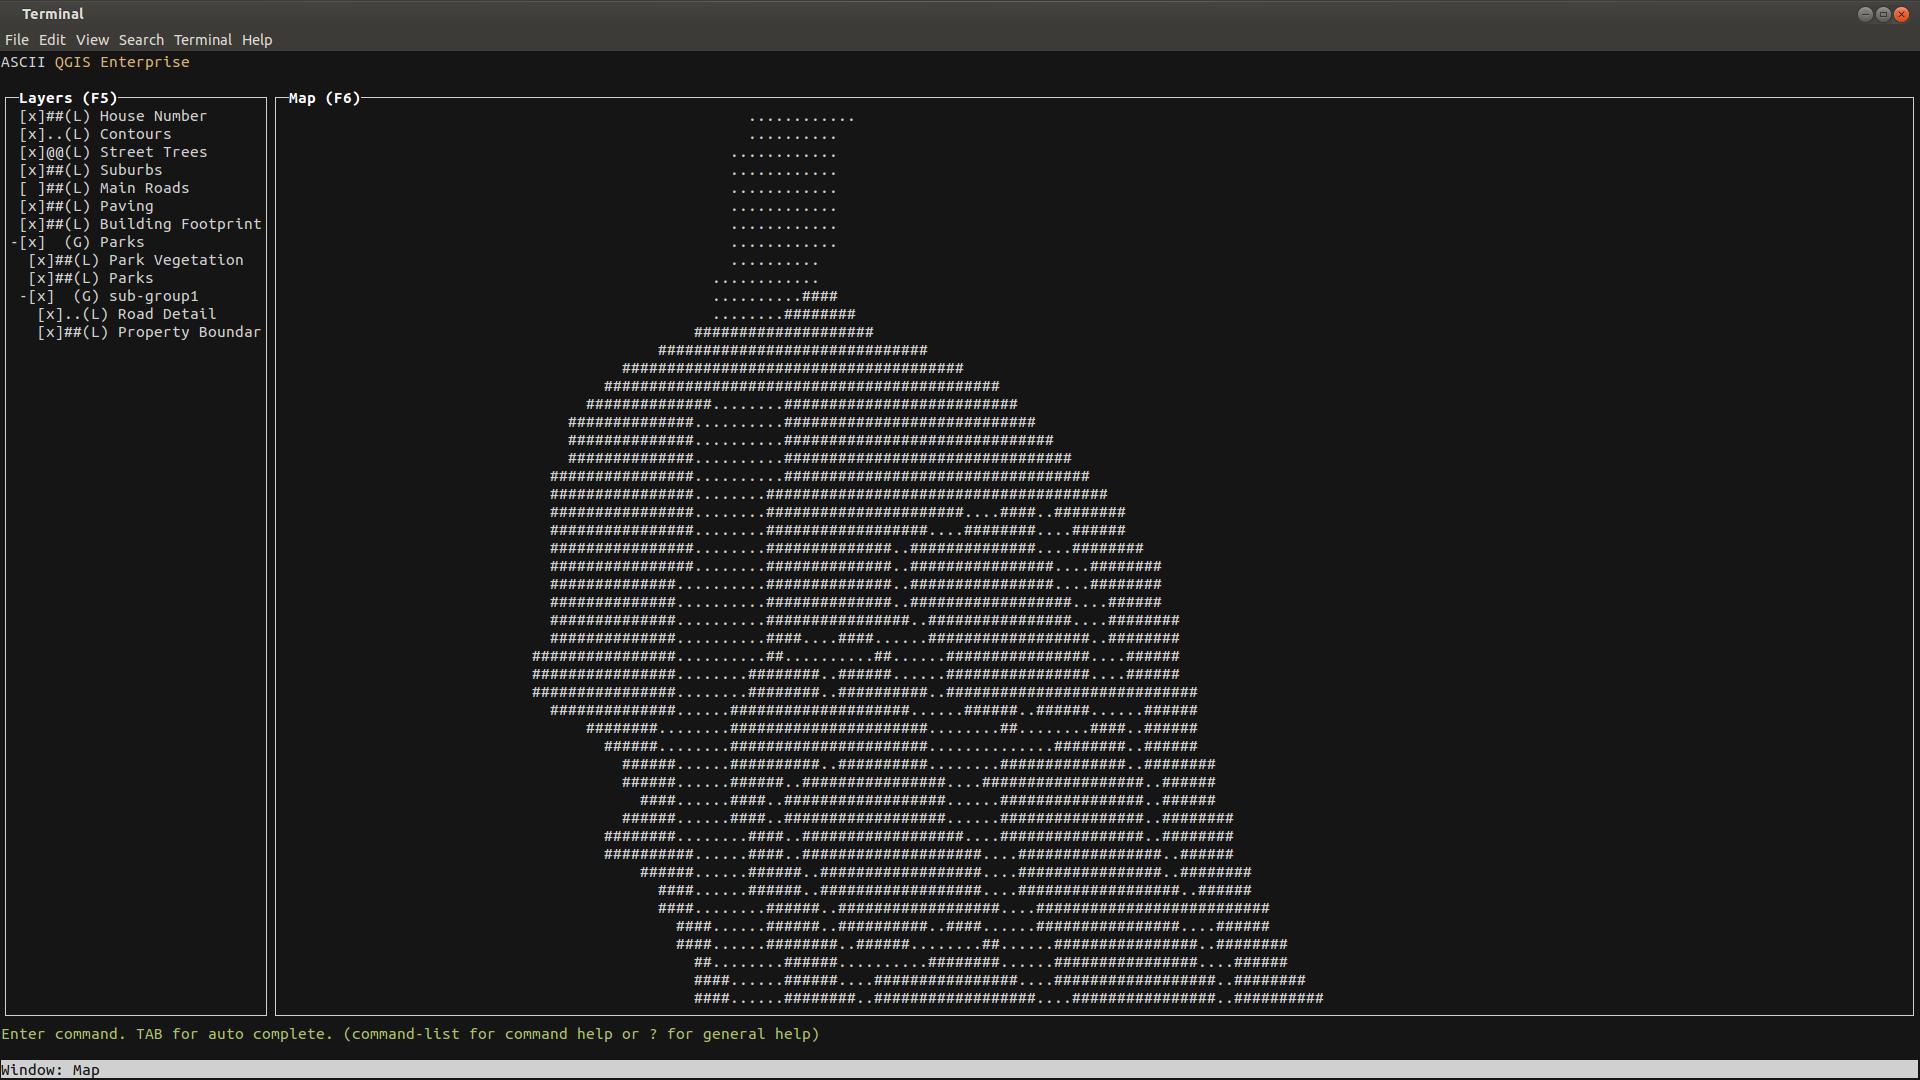 ASCII QGIS